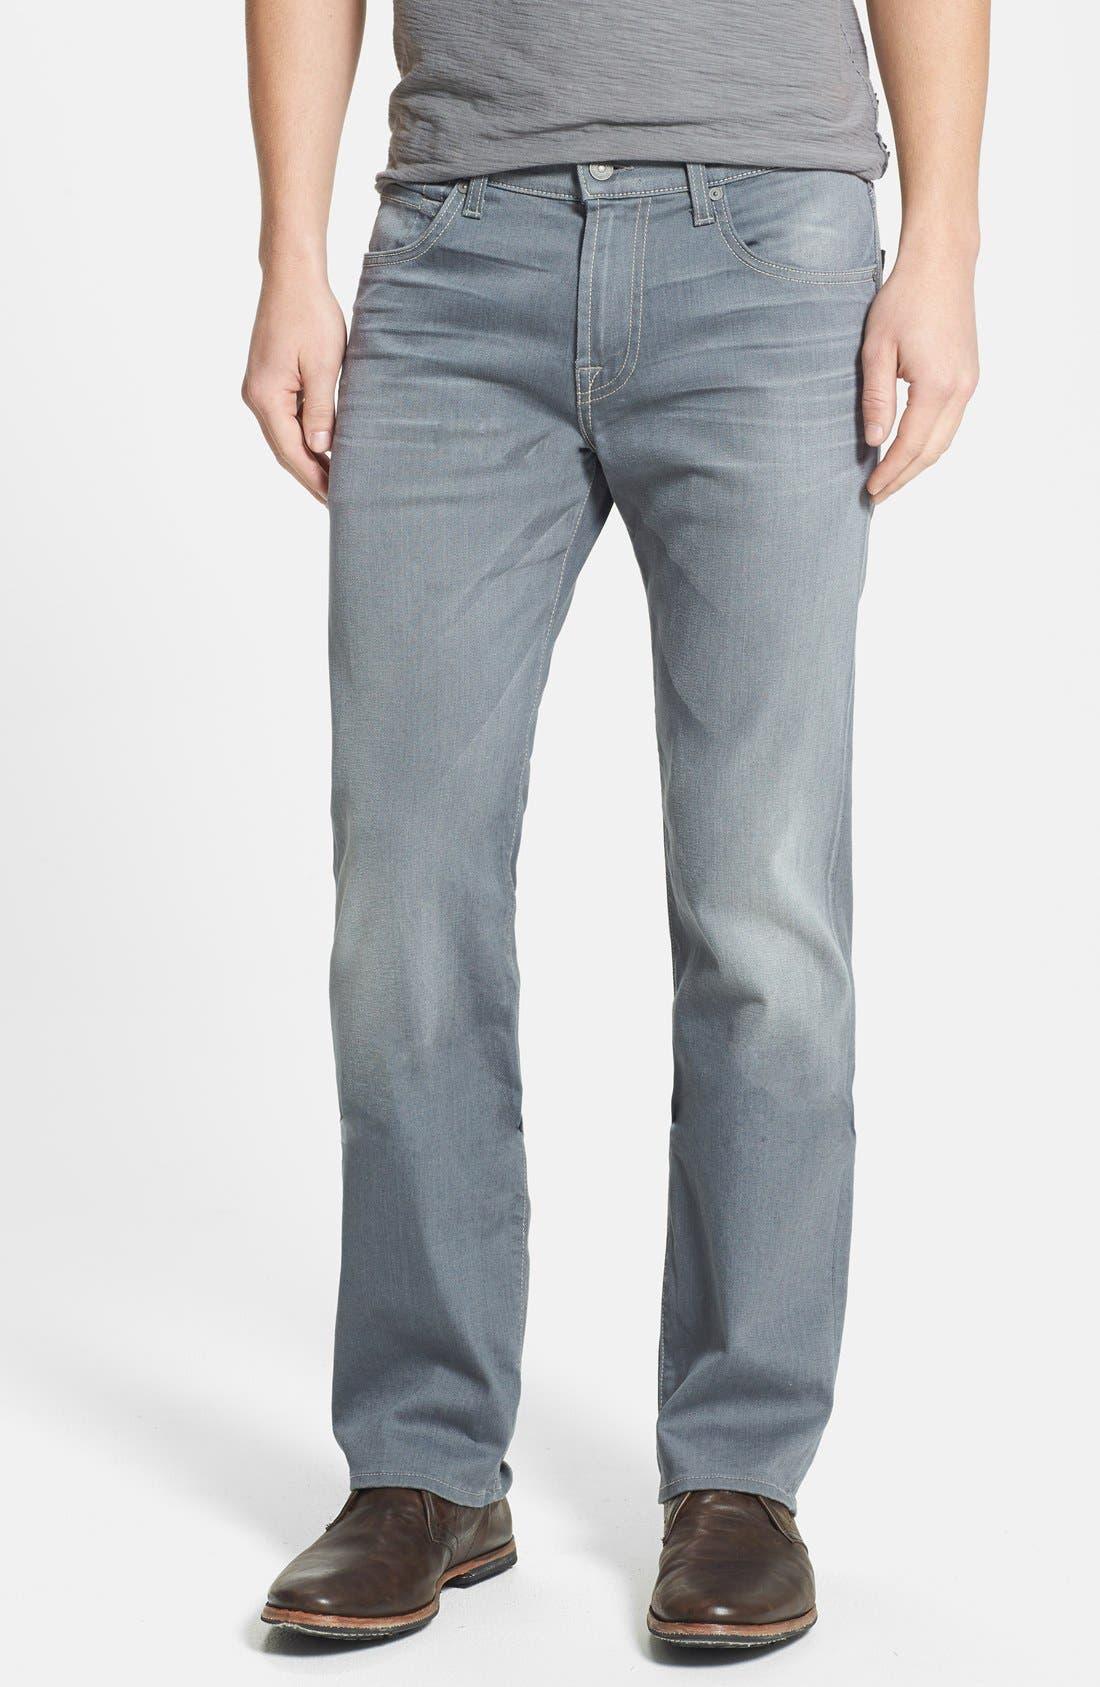 Main Image - 7 For All Mankind® 'Carsen' Straight Leg Jeans (Vesper Grey)